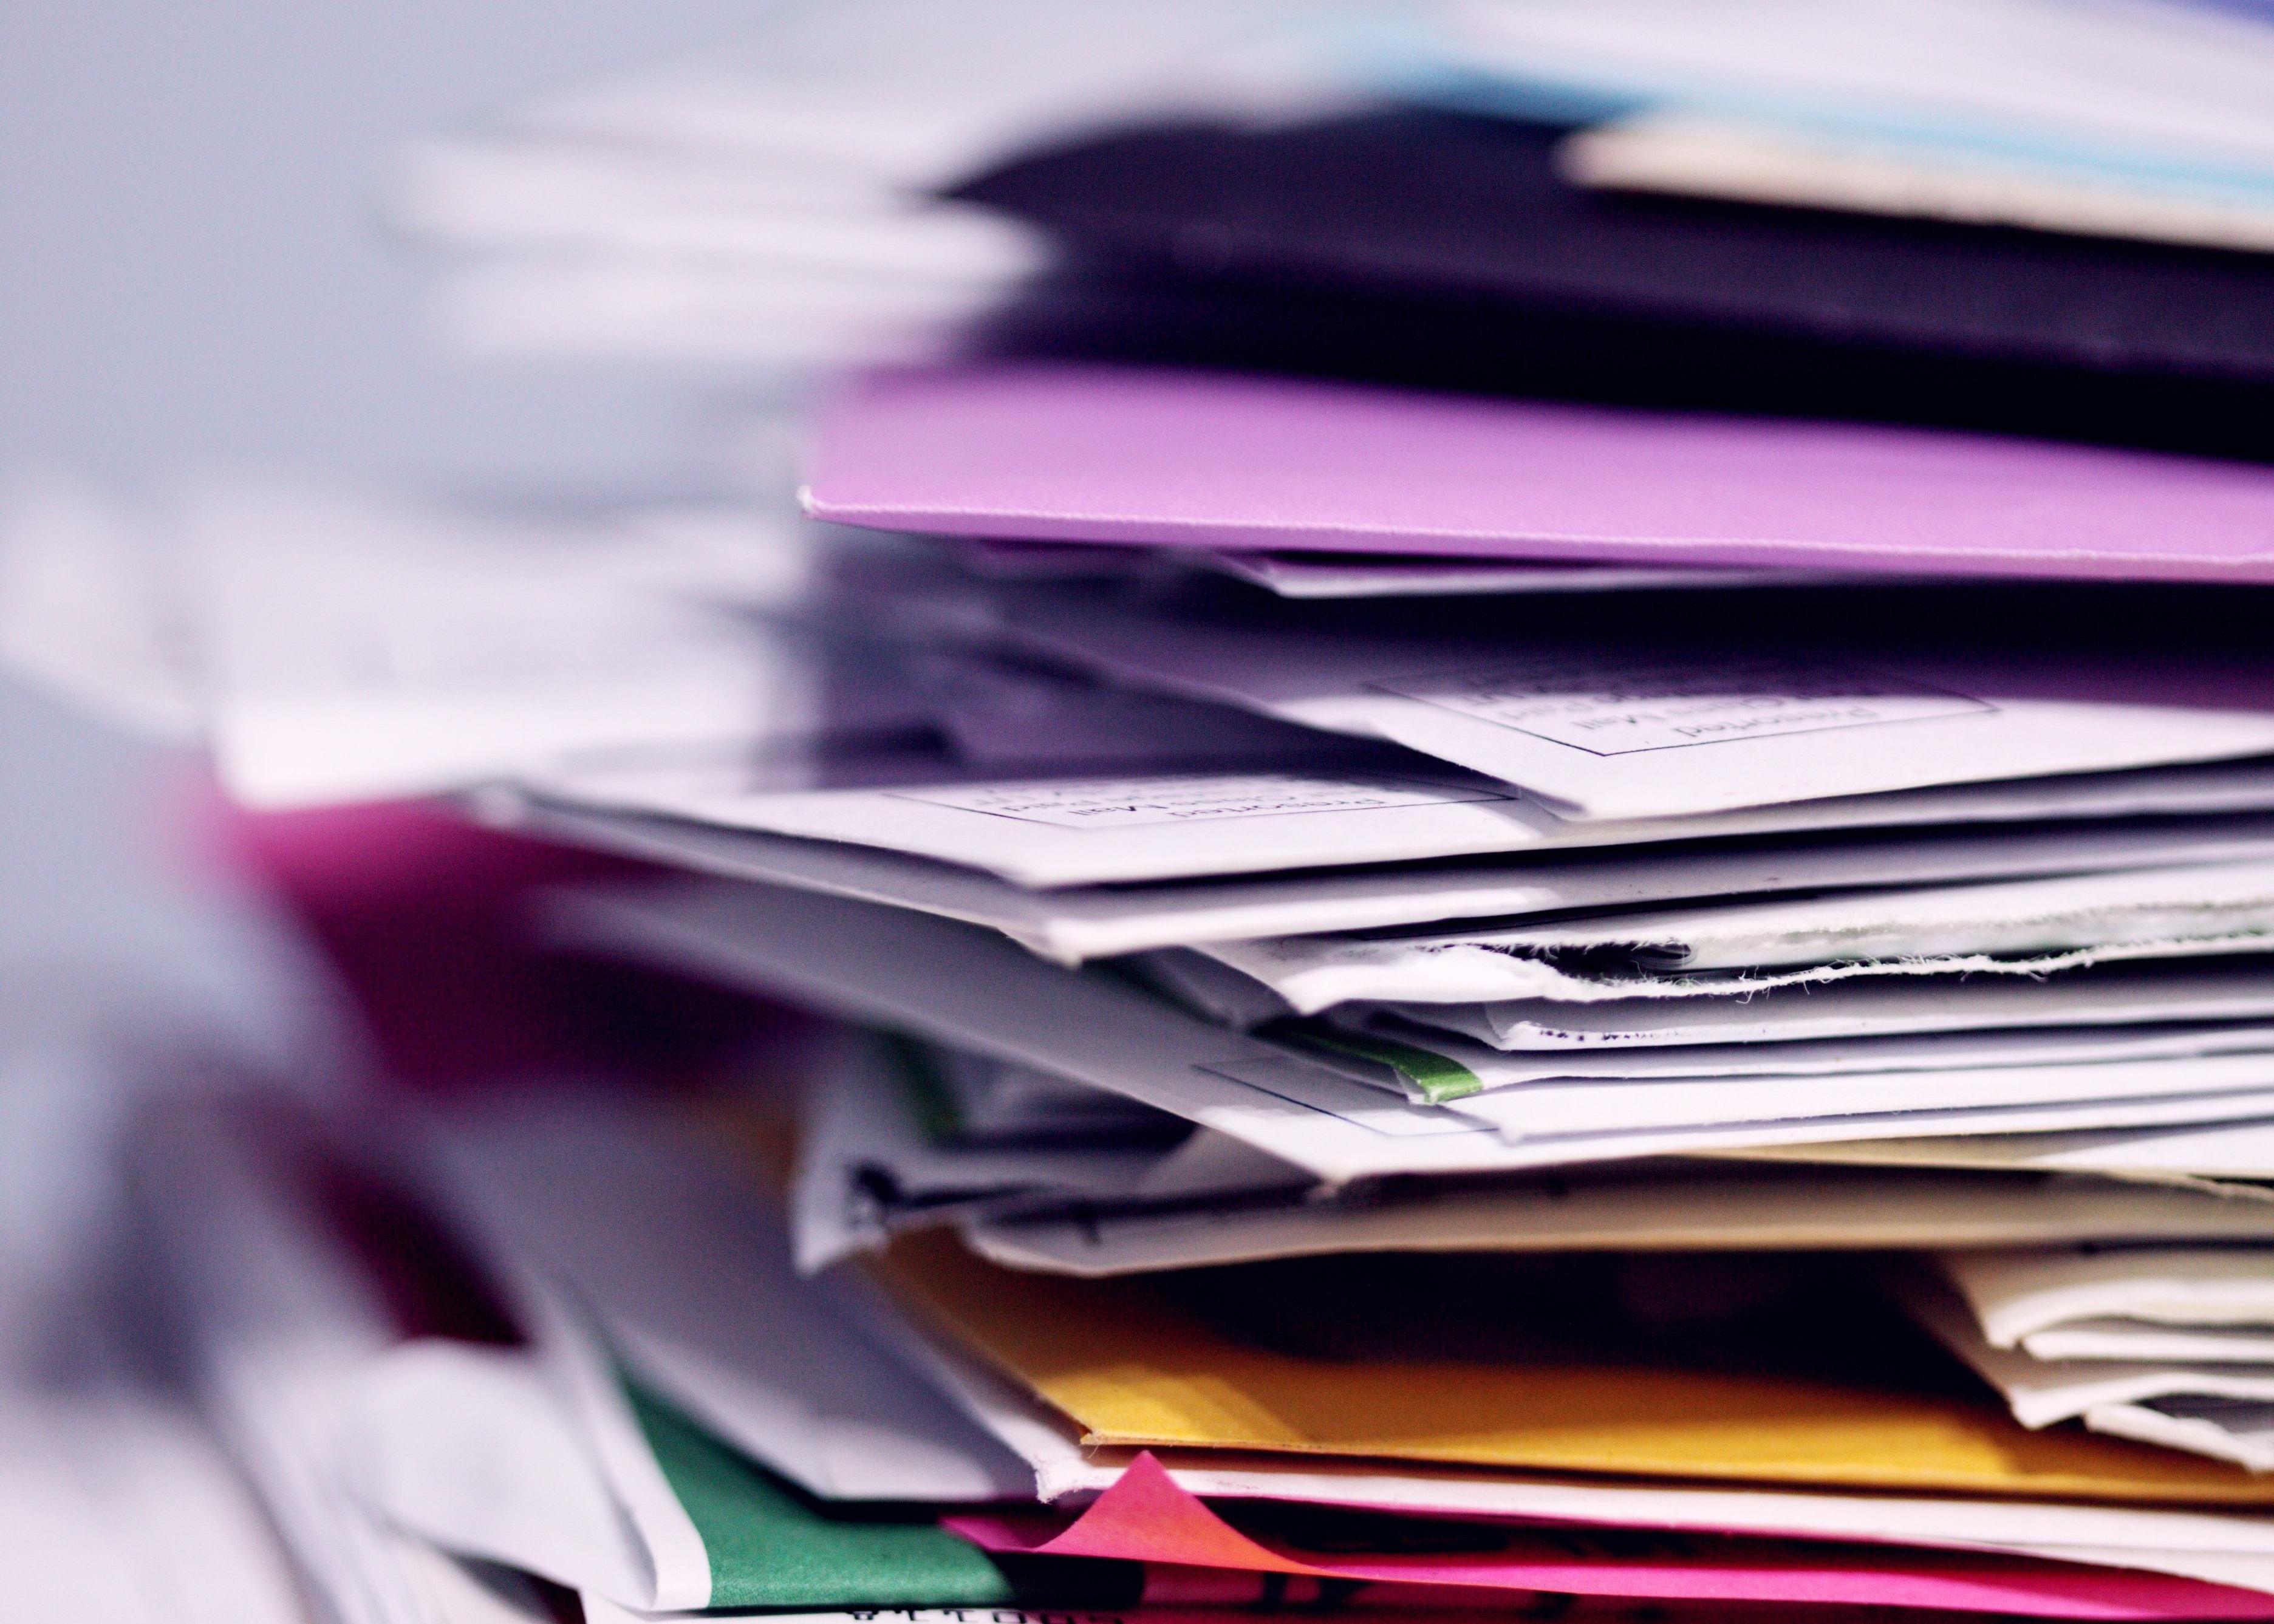 Blog Post: Paperwork anyone? Thumbnail